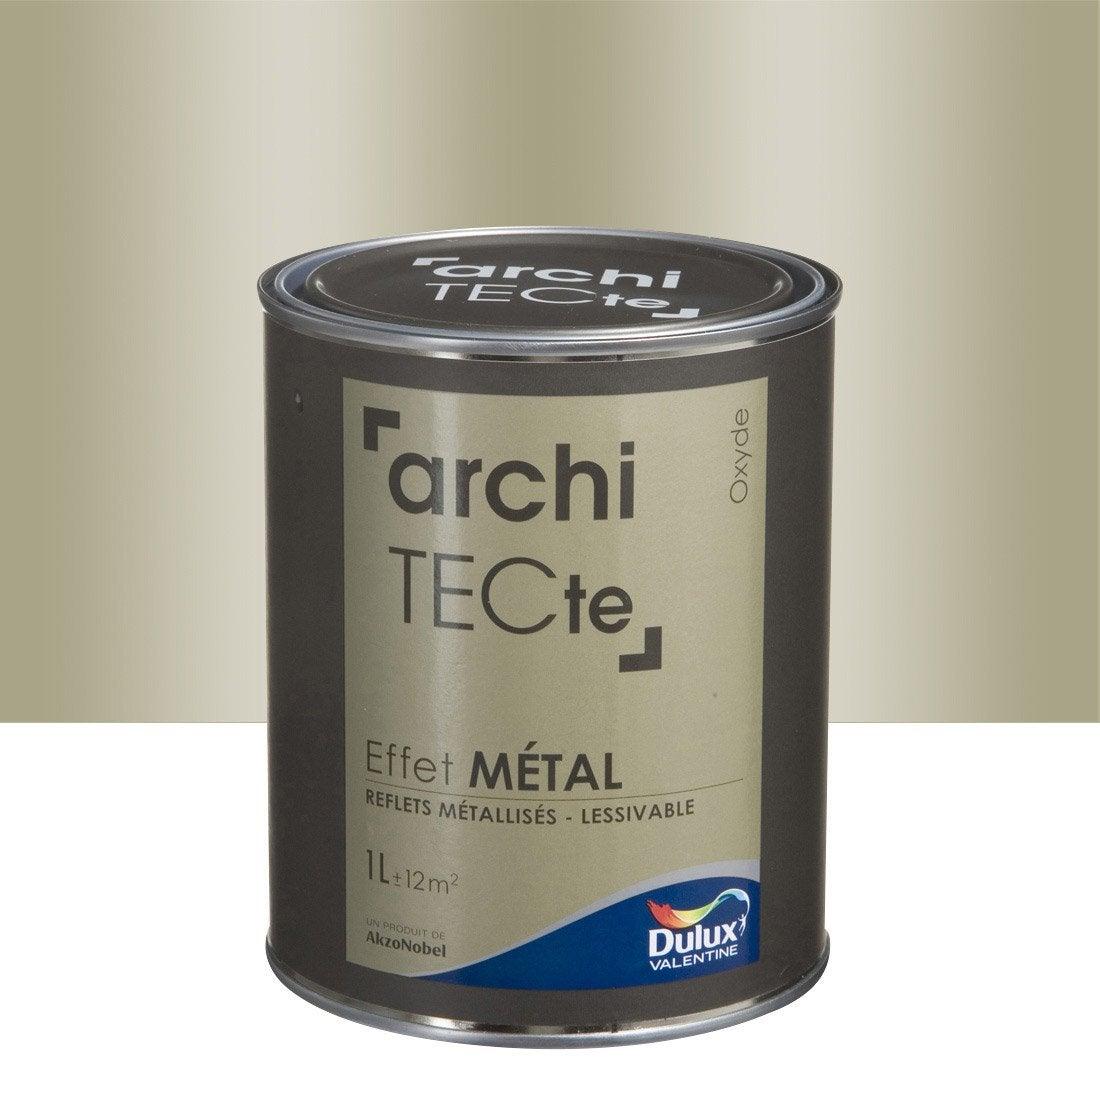 Peinture effet architecte effet m tal dulux valentine beige oxyde 1 l - Peinture effet aluminium ...